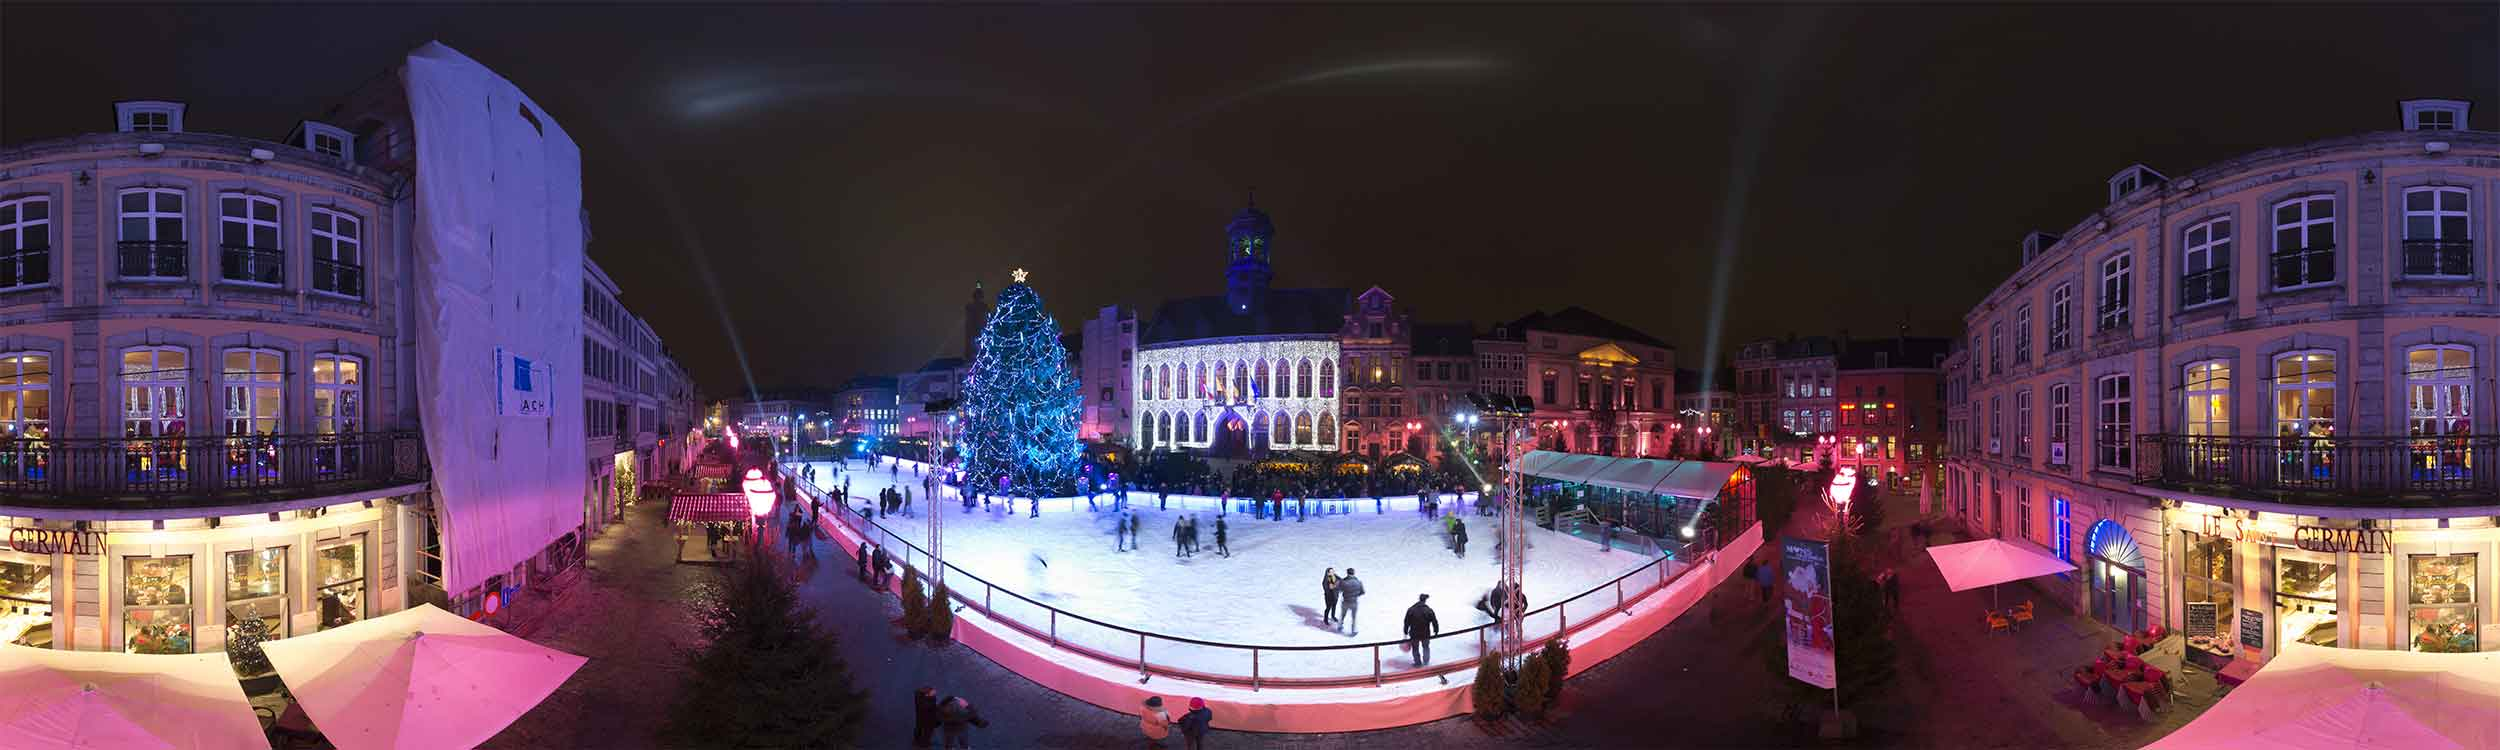 Mons coeur en neige visite virtuelle vue 360